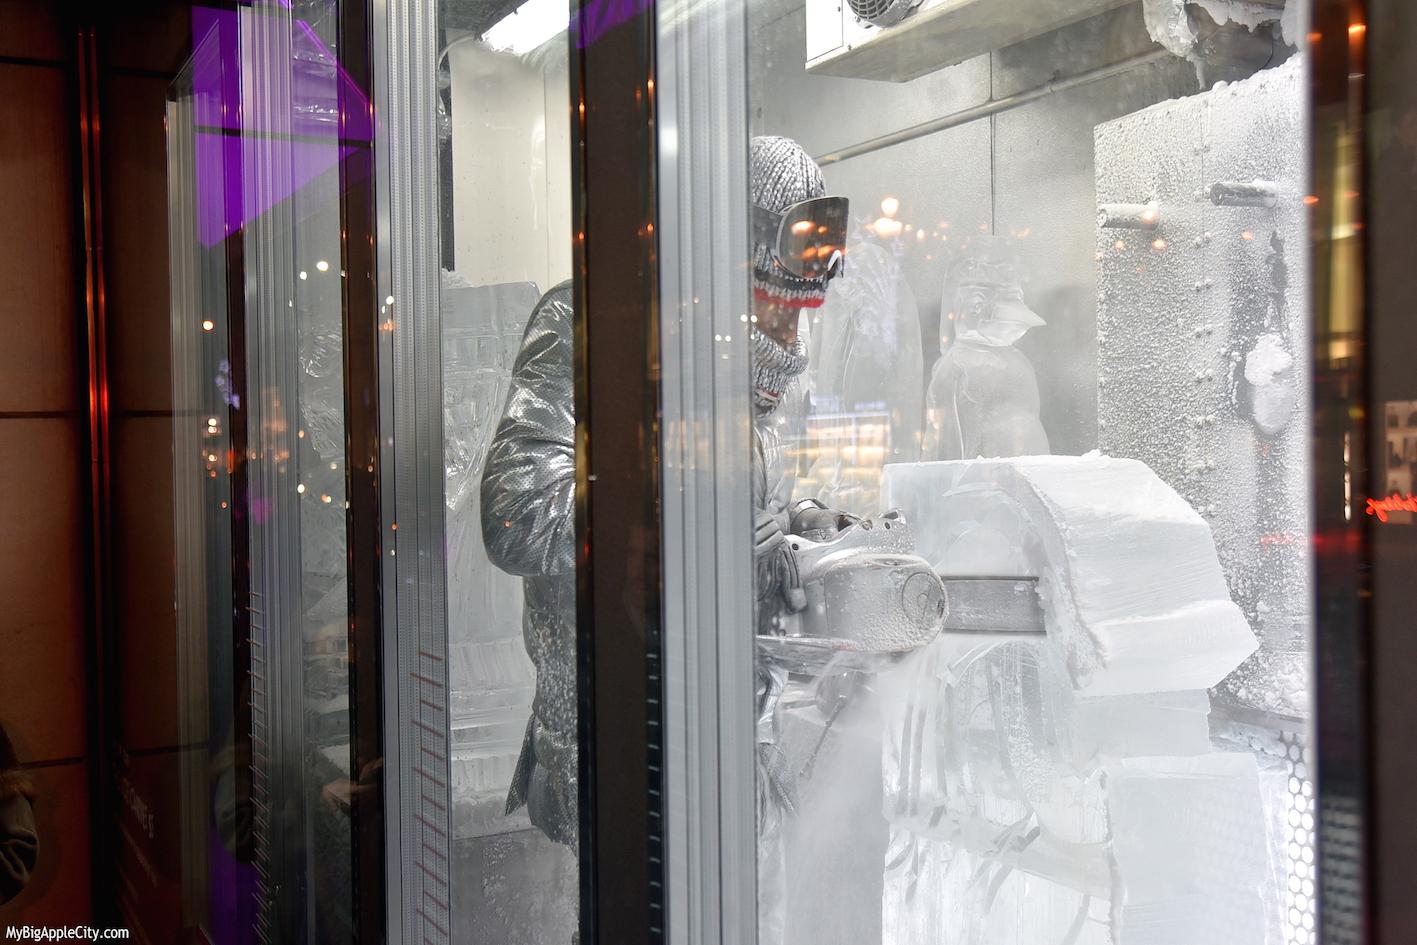 Ice-sculptor-Barneys-Holiday-windows-new-york-travelblogger-mybigapplecity